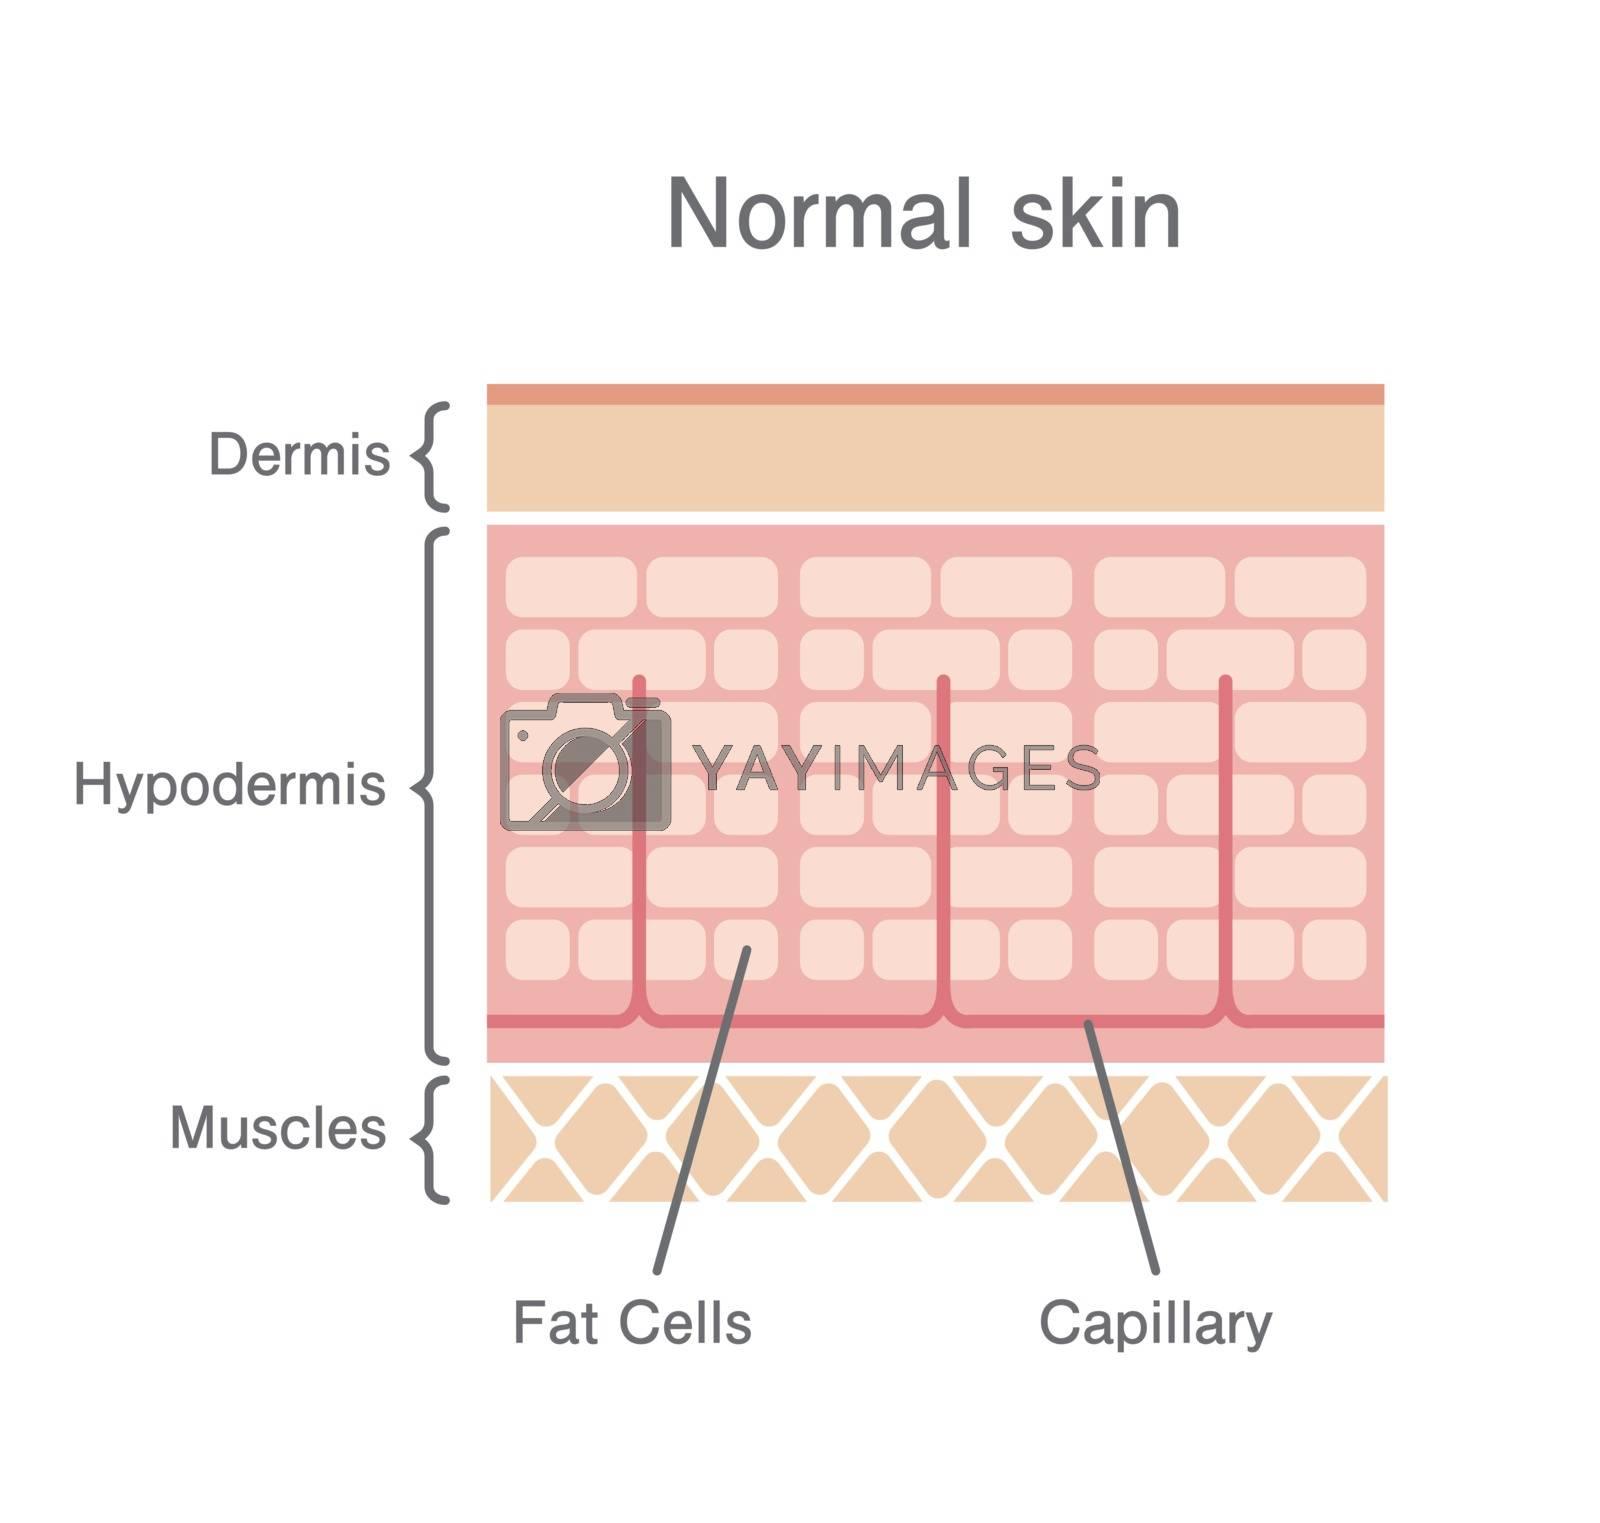 Normal skin illustration